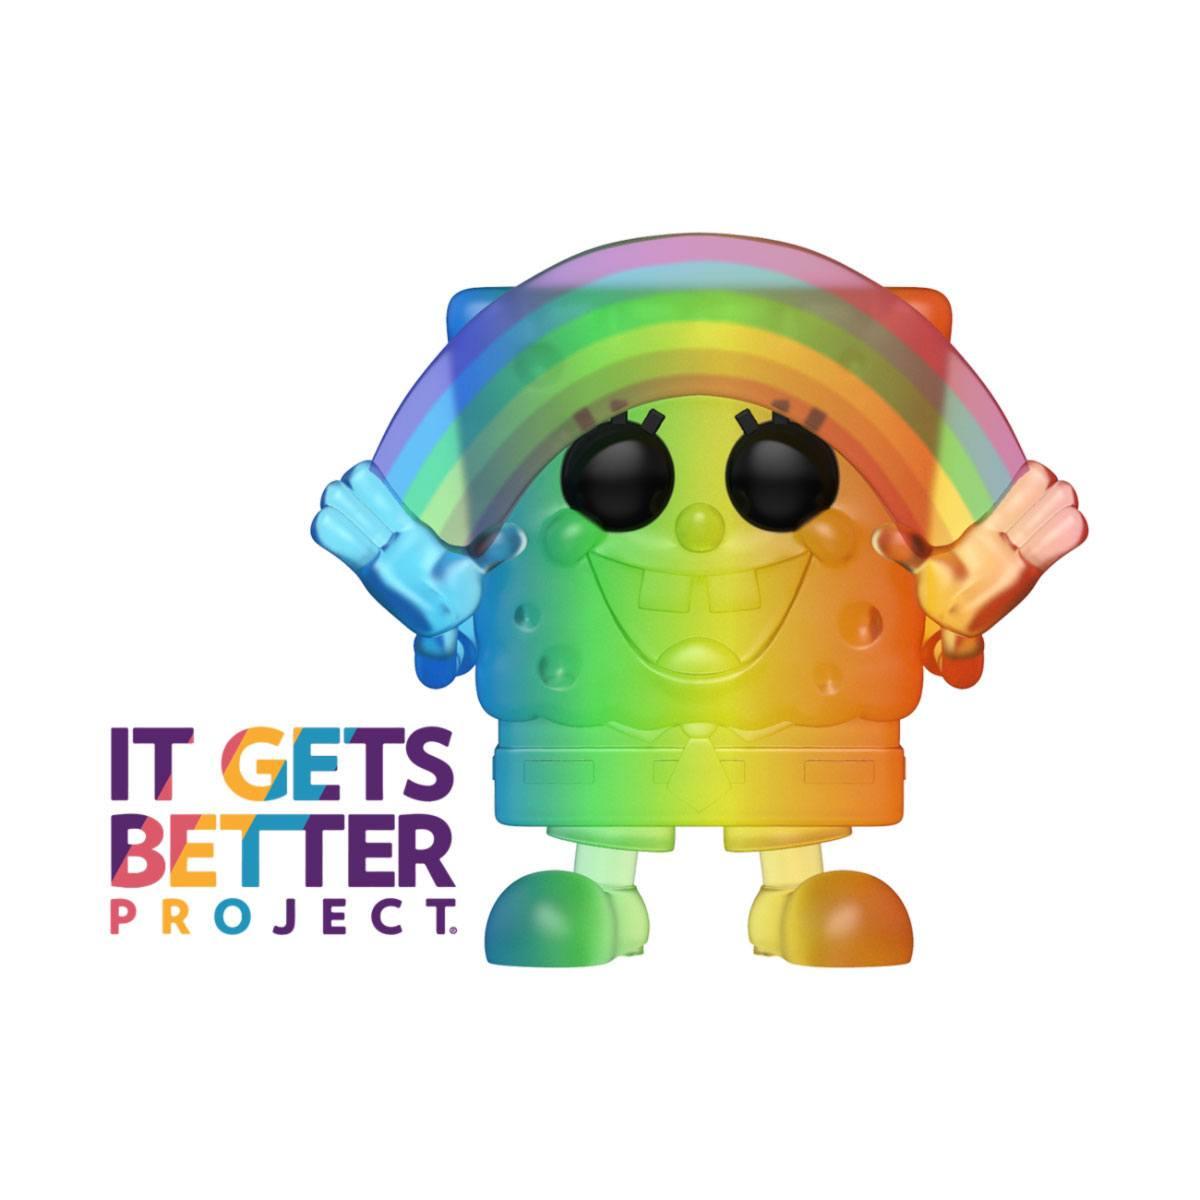 Pride 2020 SpongeBob SquarePants POP! Animation Vinyl Figure Spongebob (RNBW) 9 cm